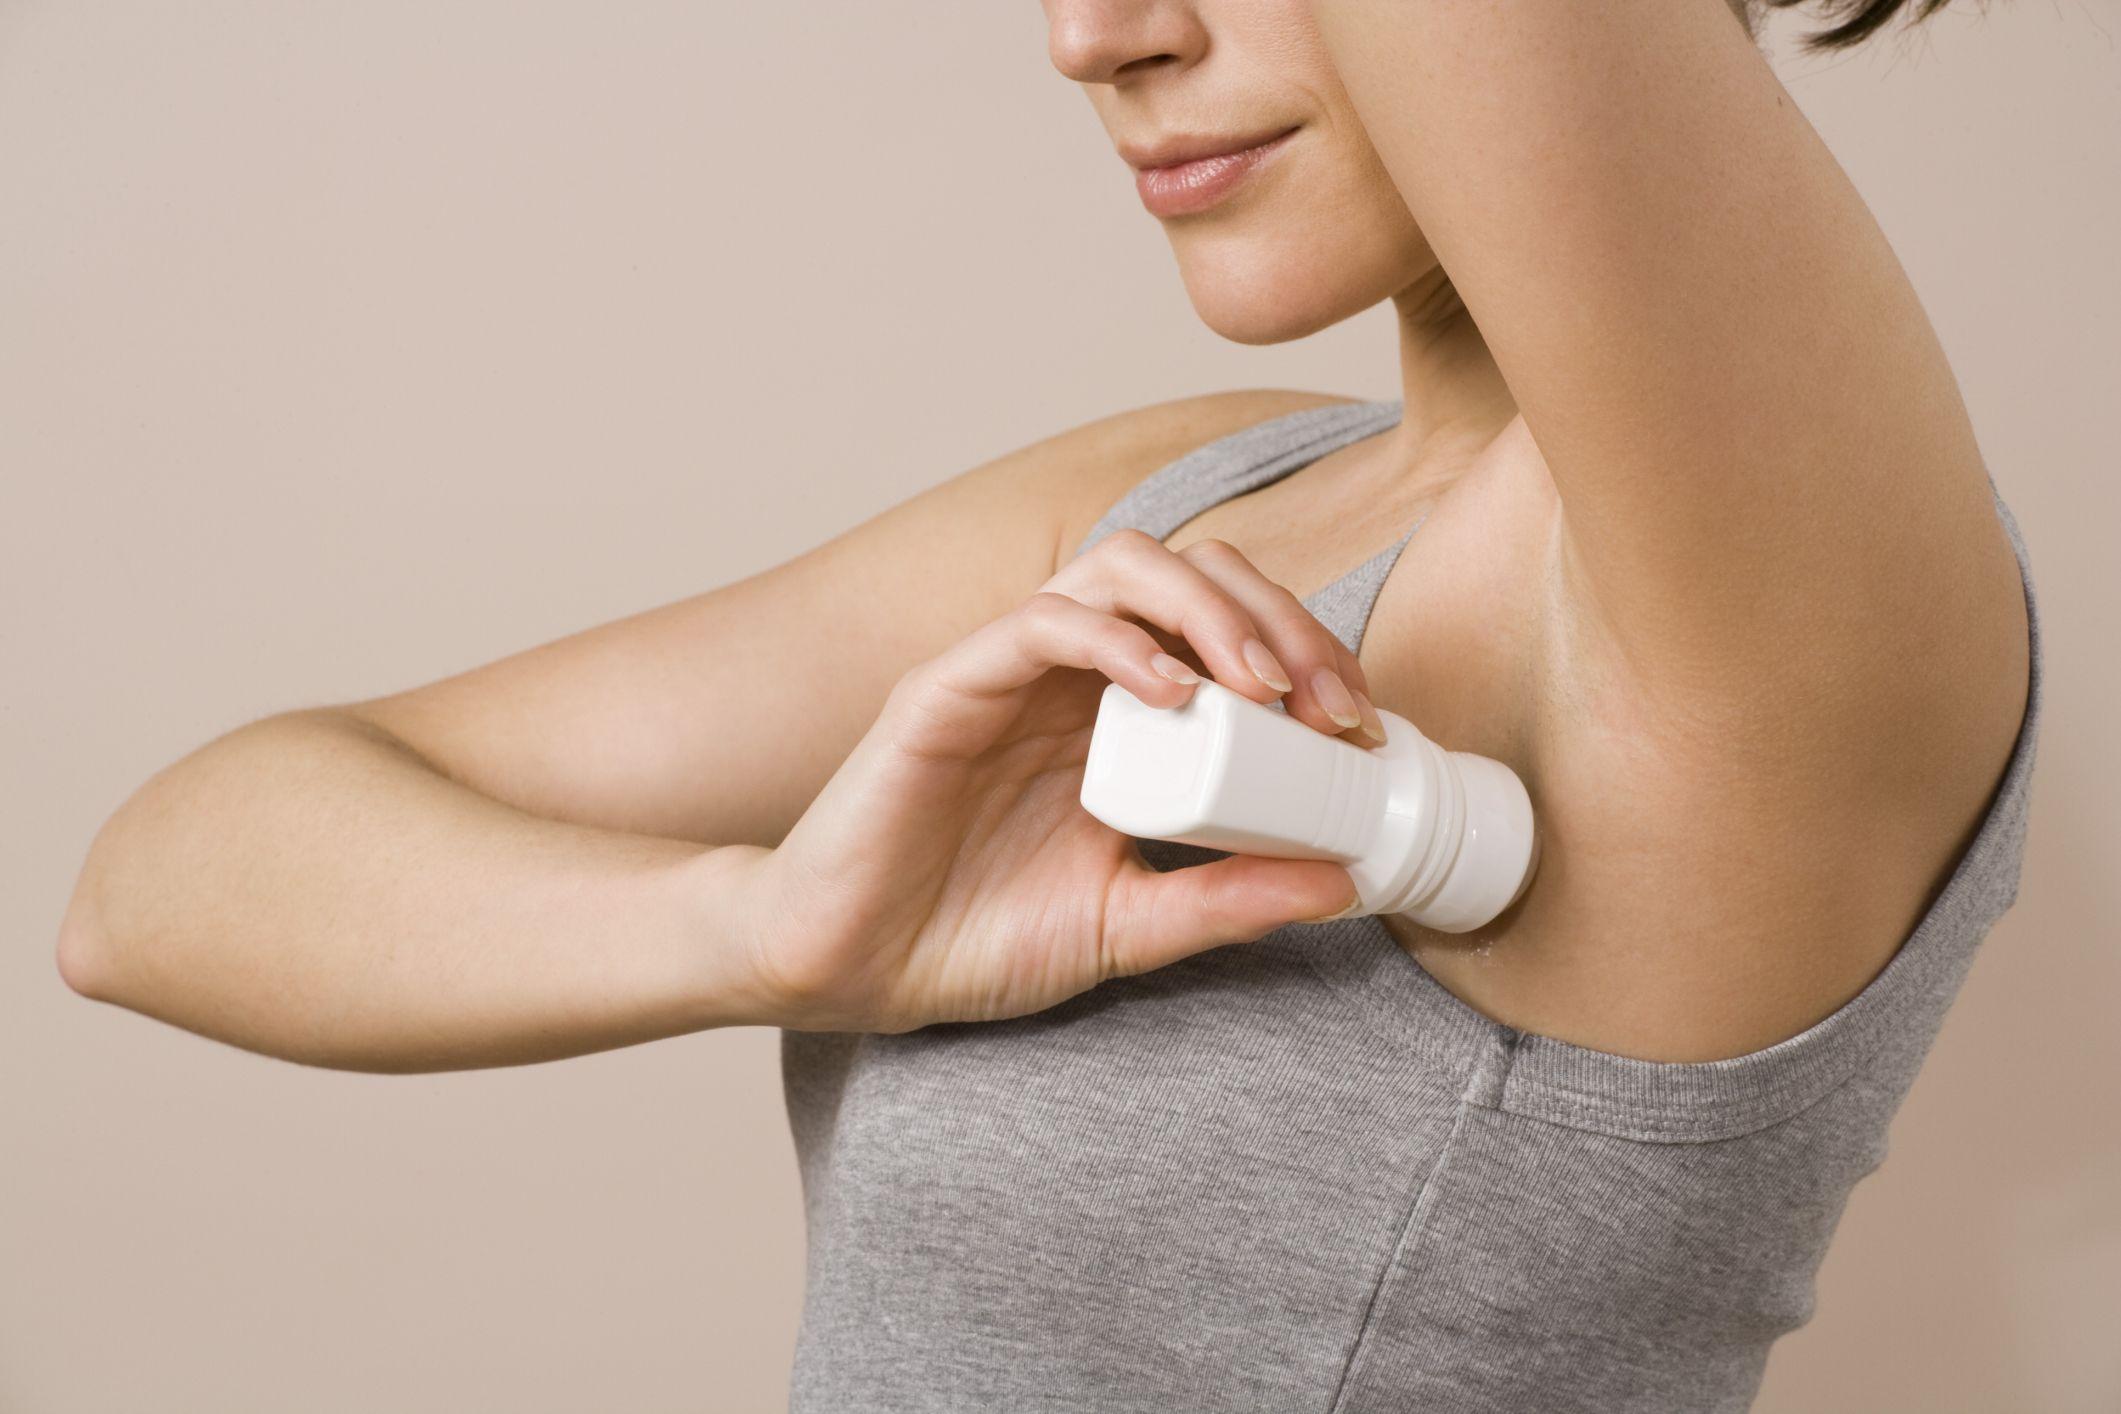 6. Jangan lupa menggunakan deodoran